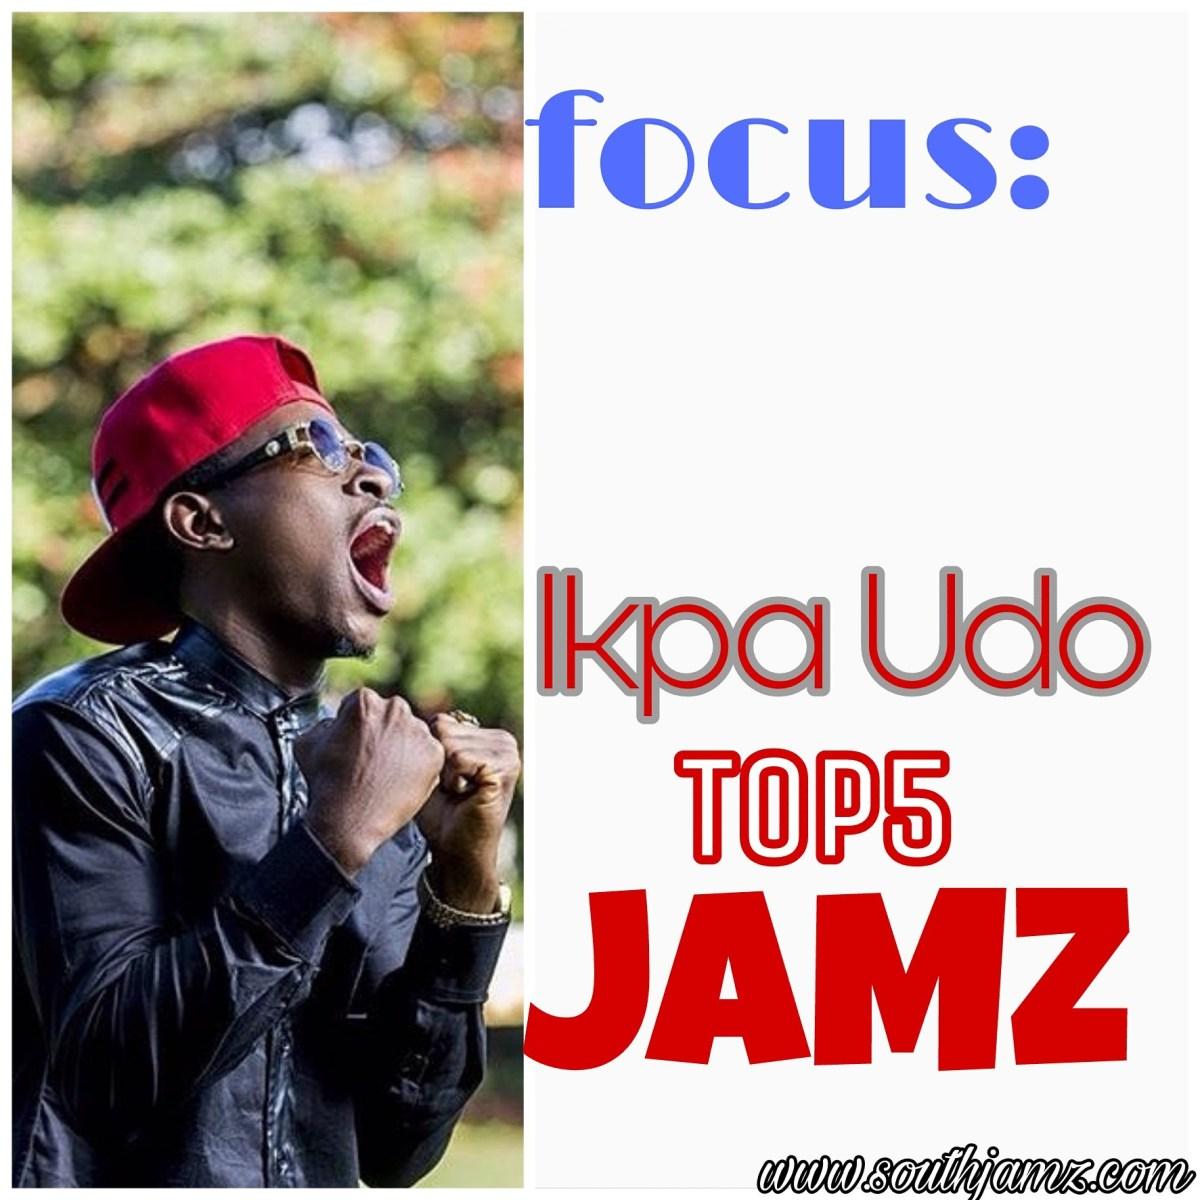 Focus: Ikpa udo - Top5 Jamz Yet // @Ikpa_Udo